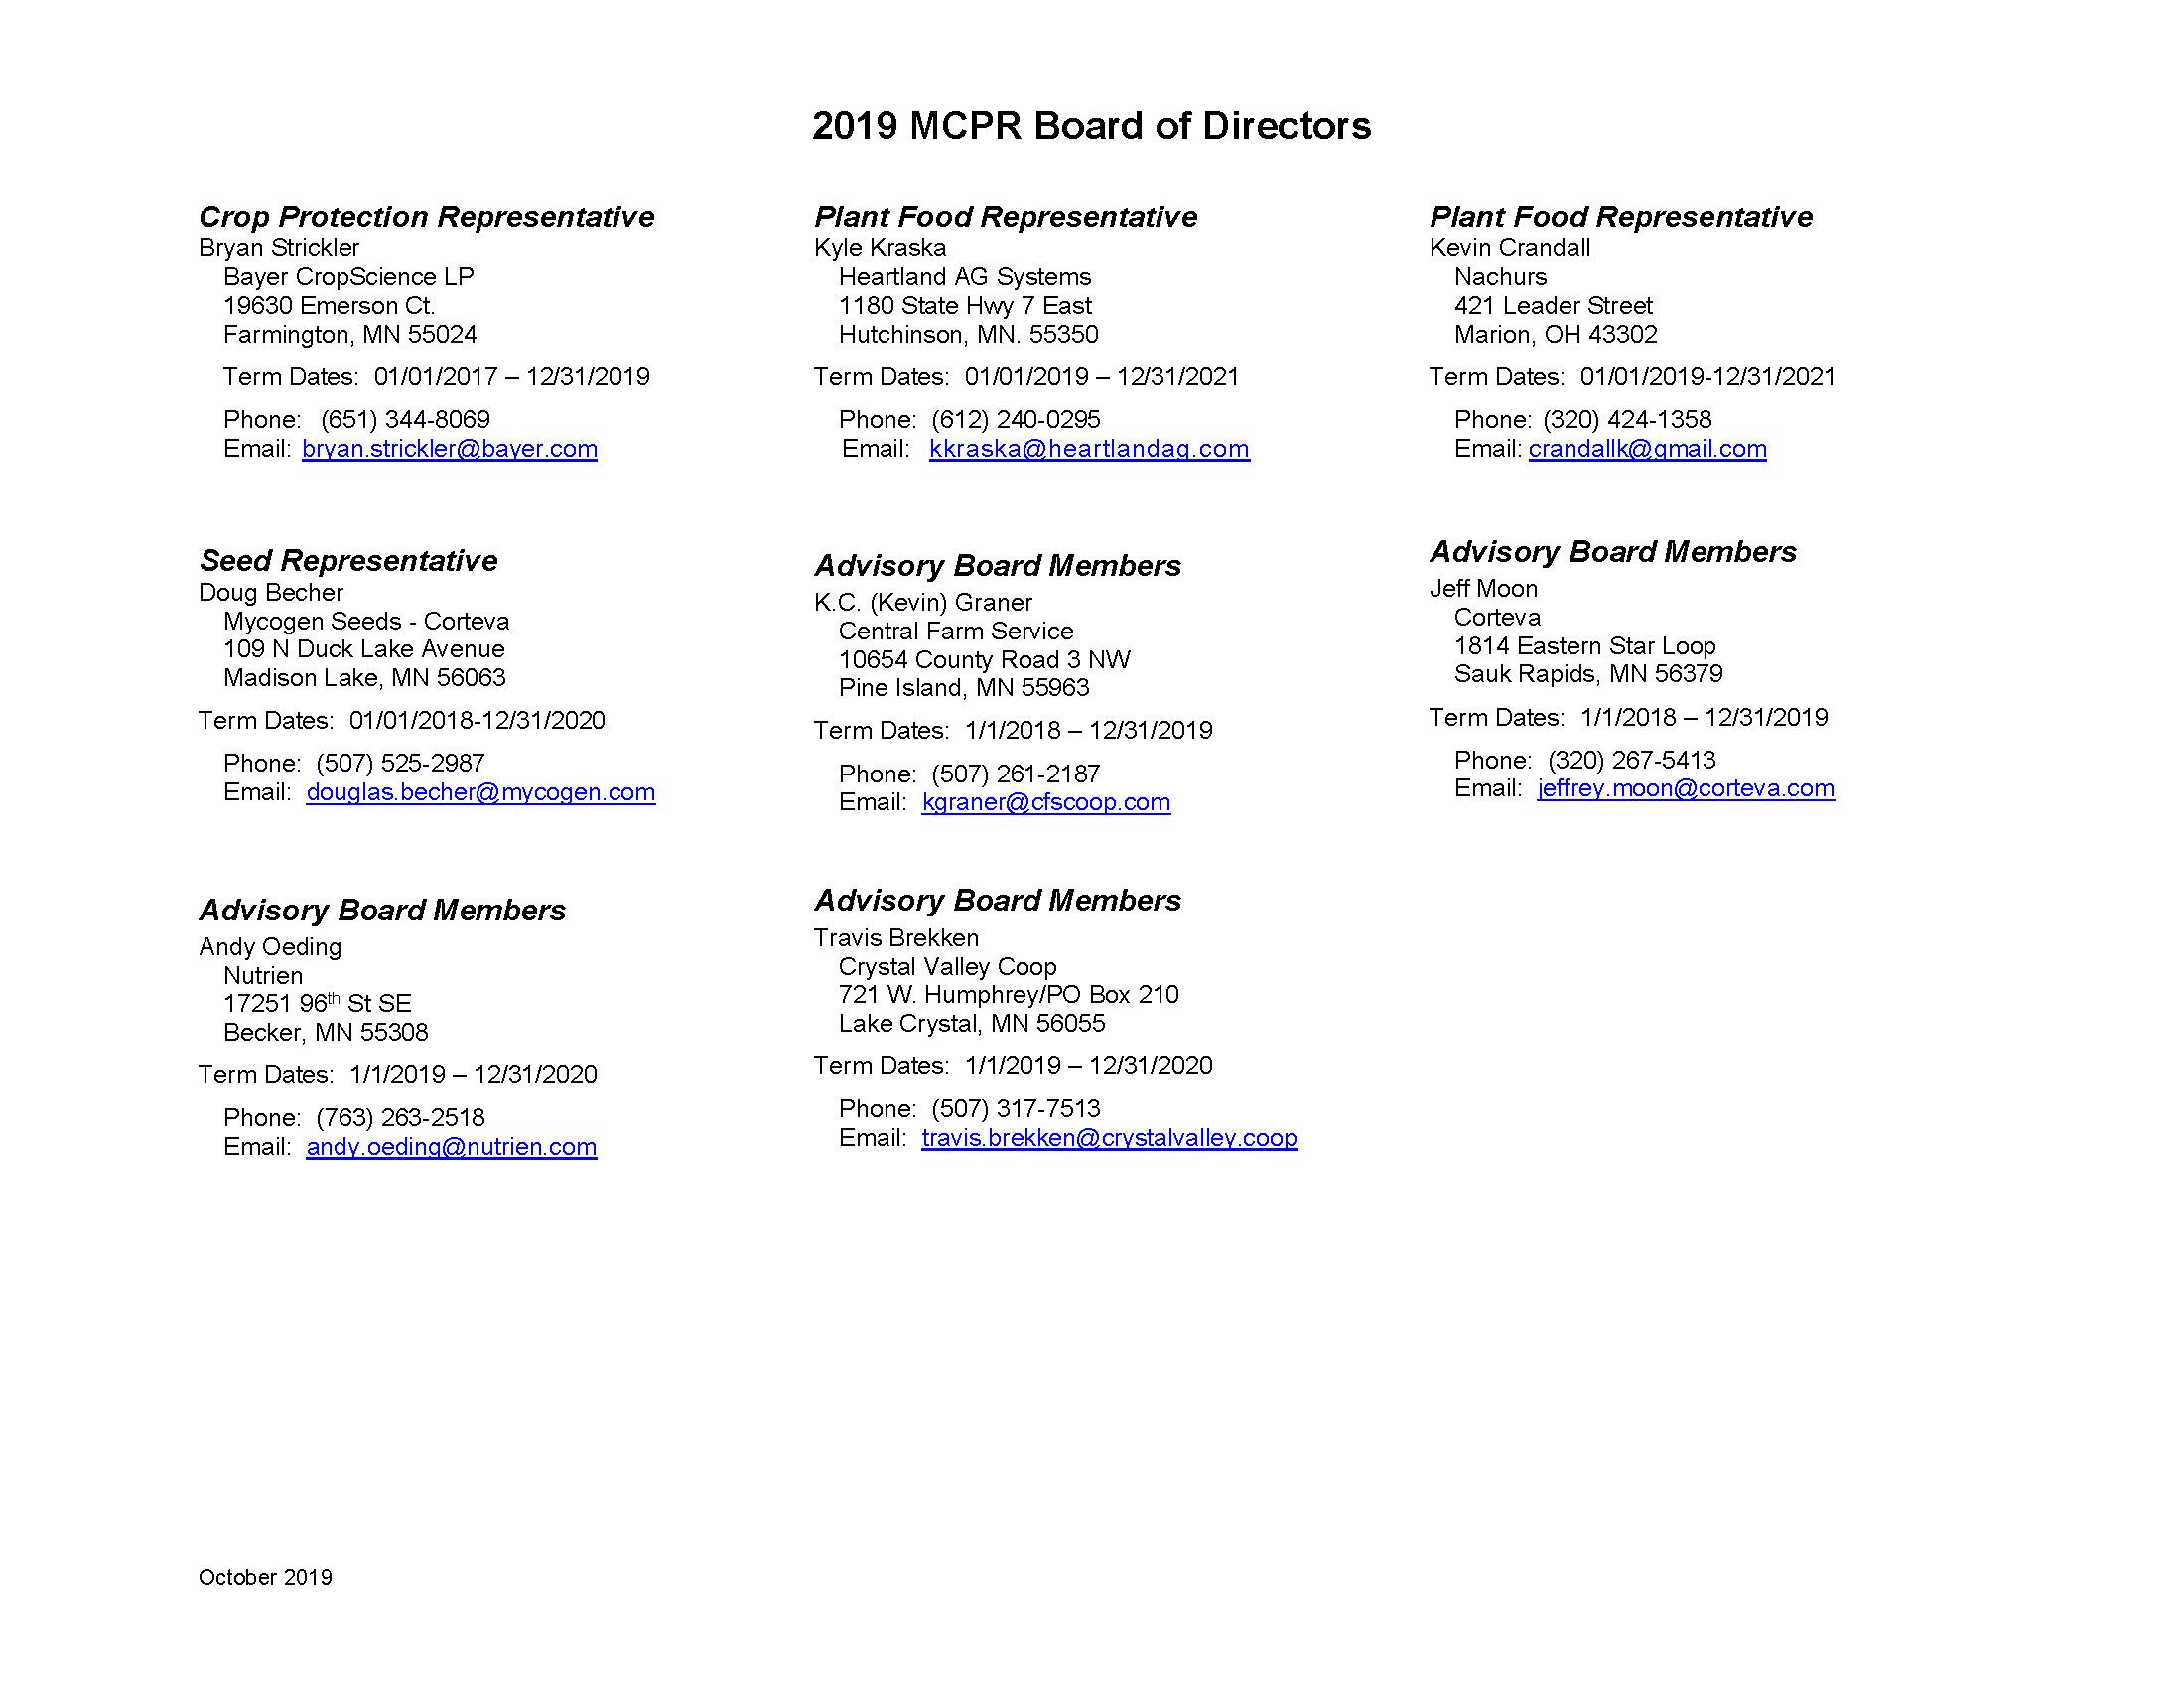 2019 MCPR Board of Directors_October_2019_Page_2